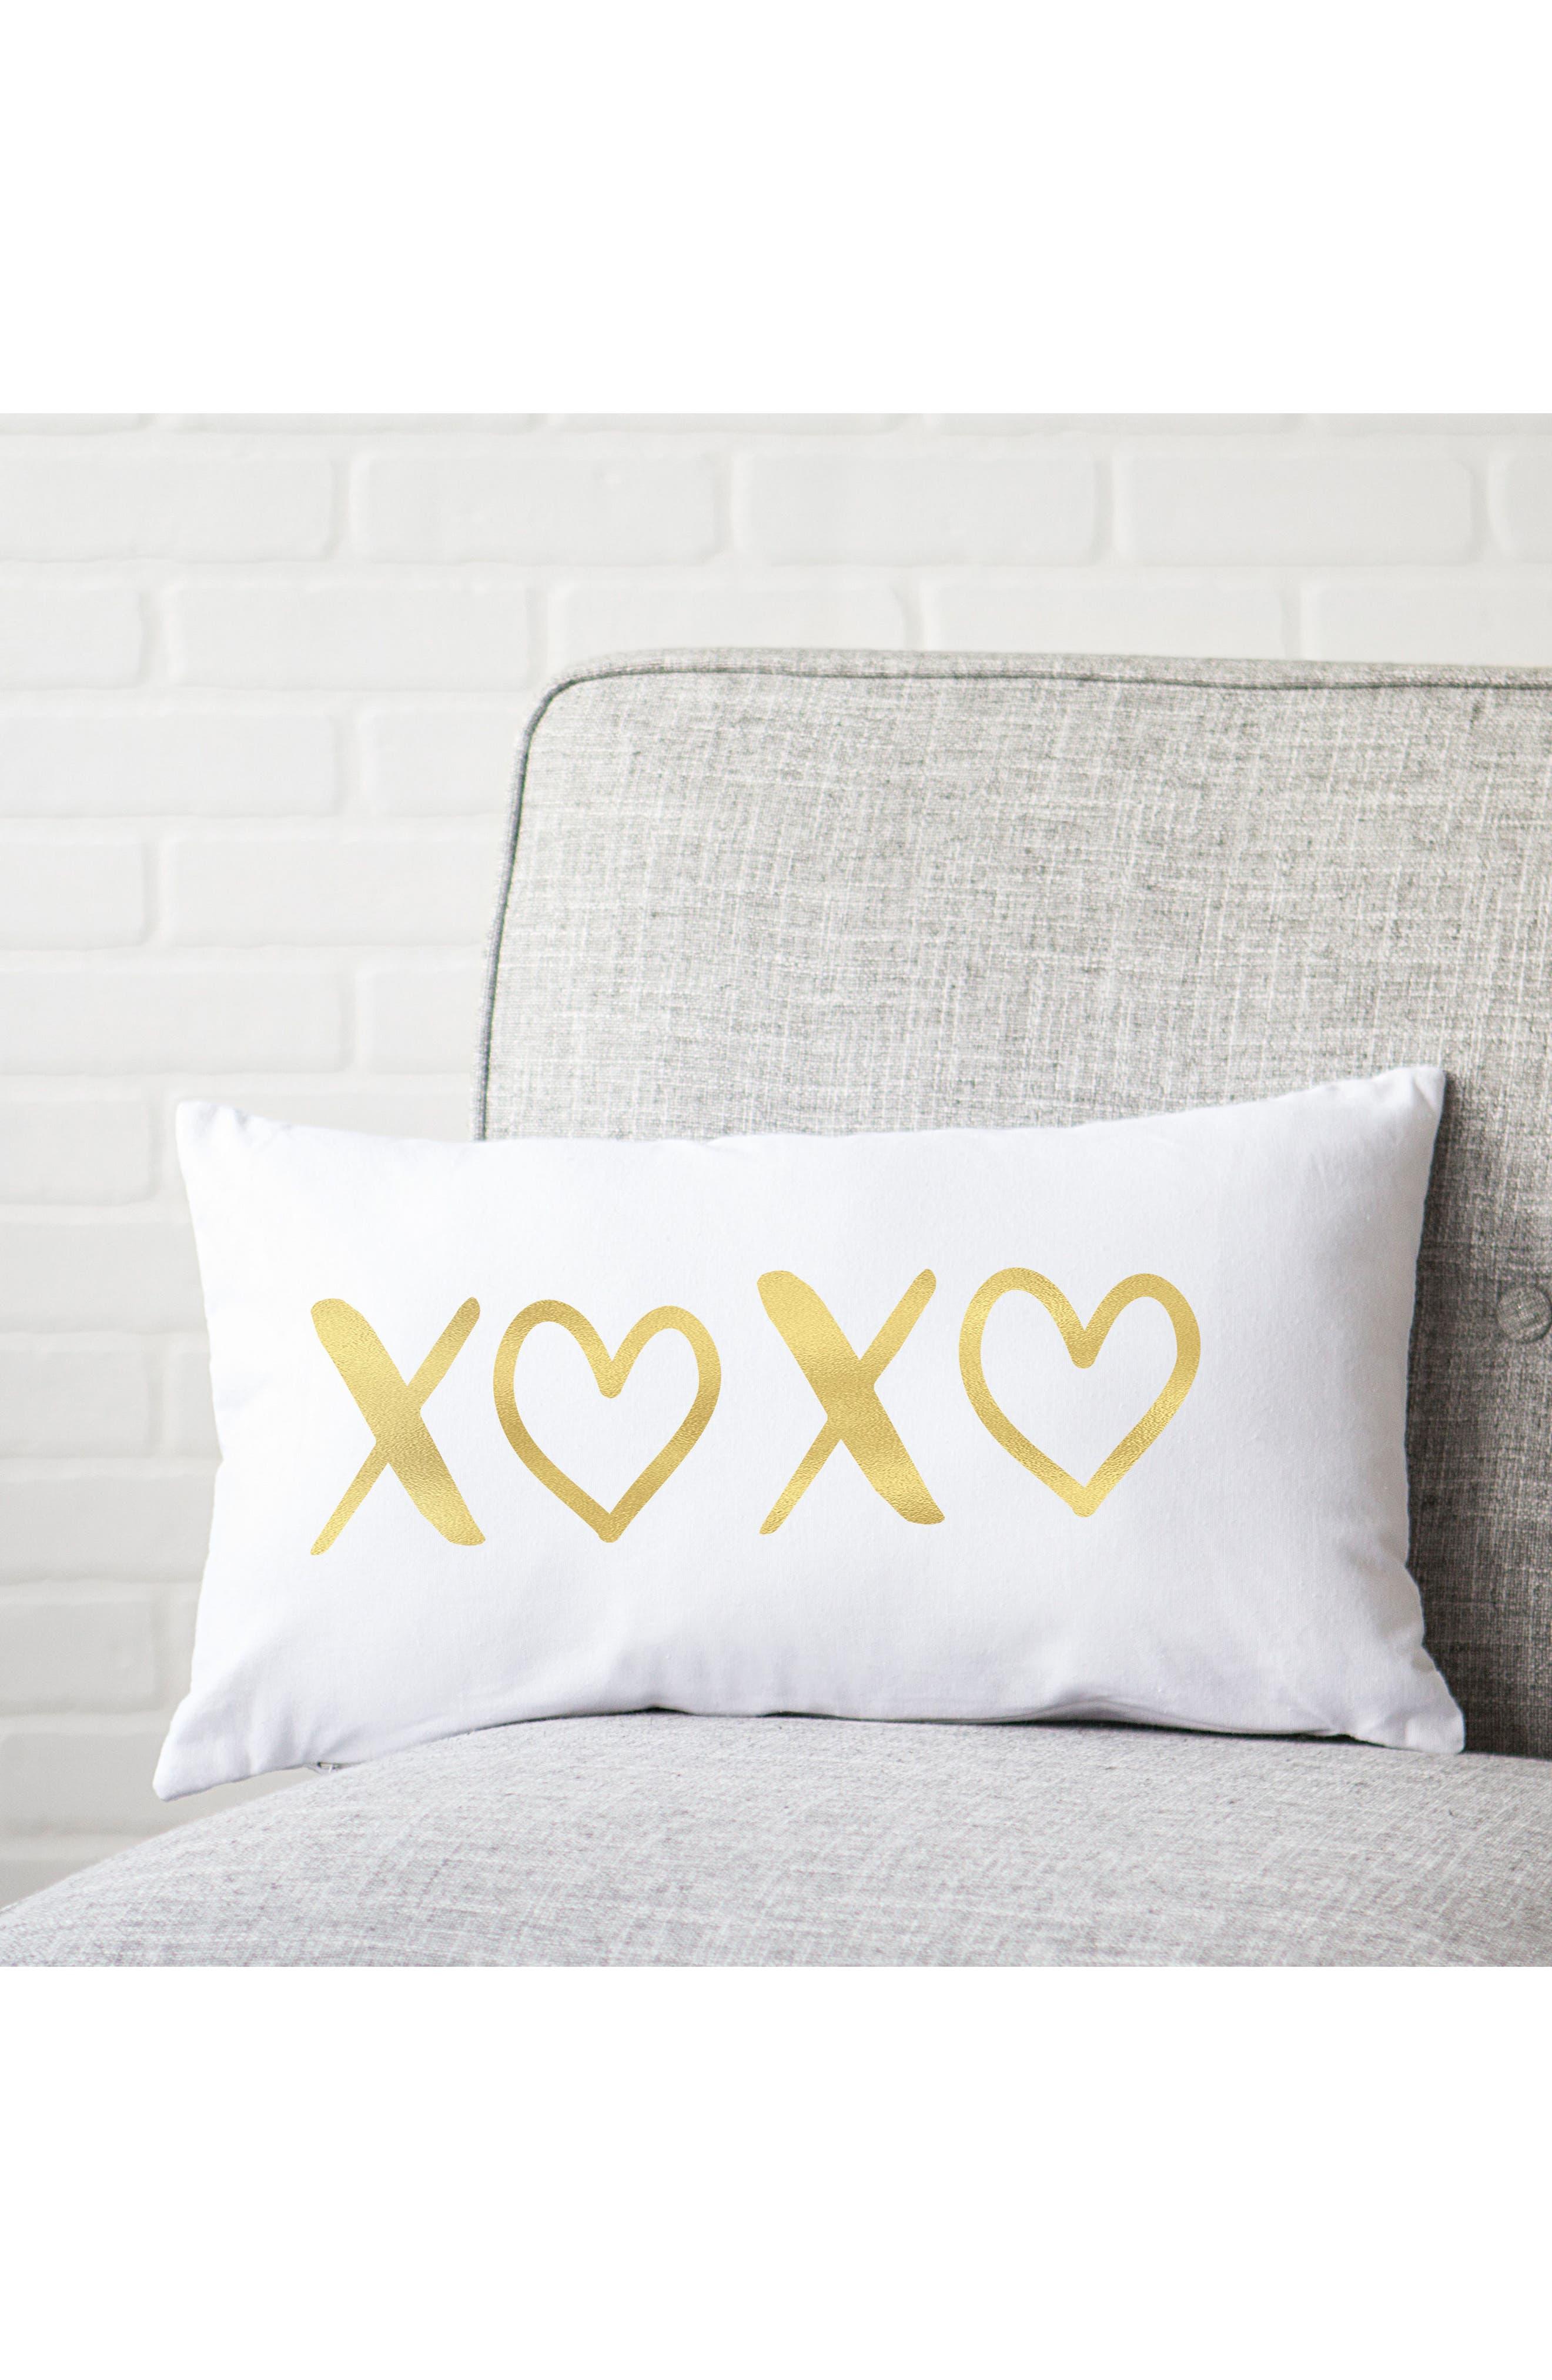 XOXO Accent Pillow,                             Alternate thumbnail 2, color,                             Gold